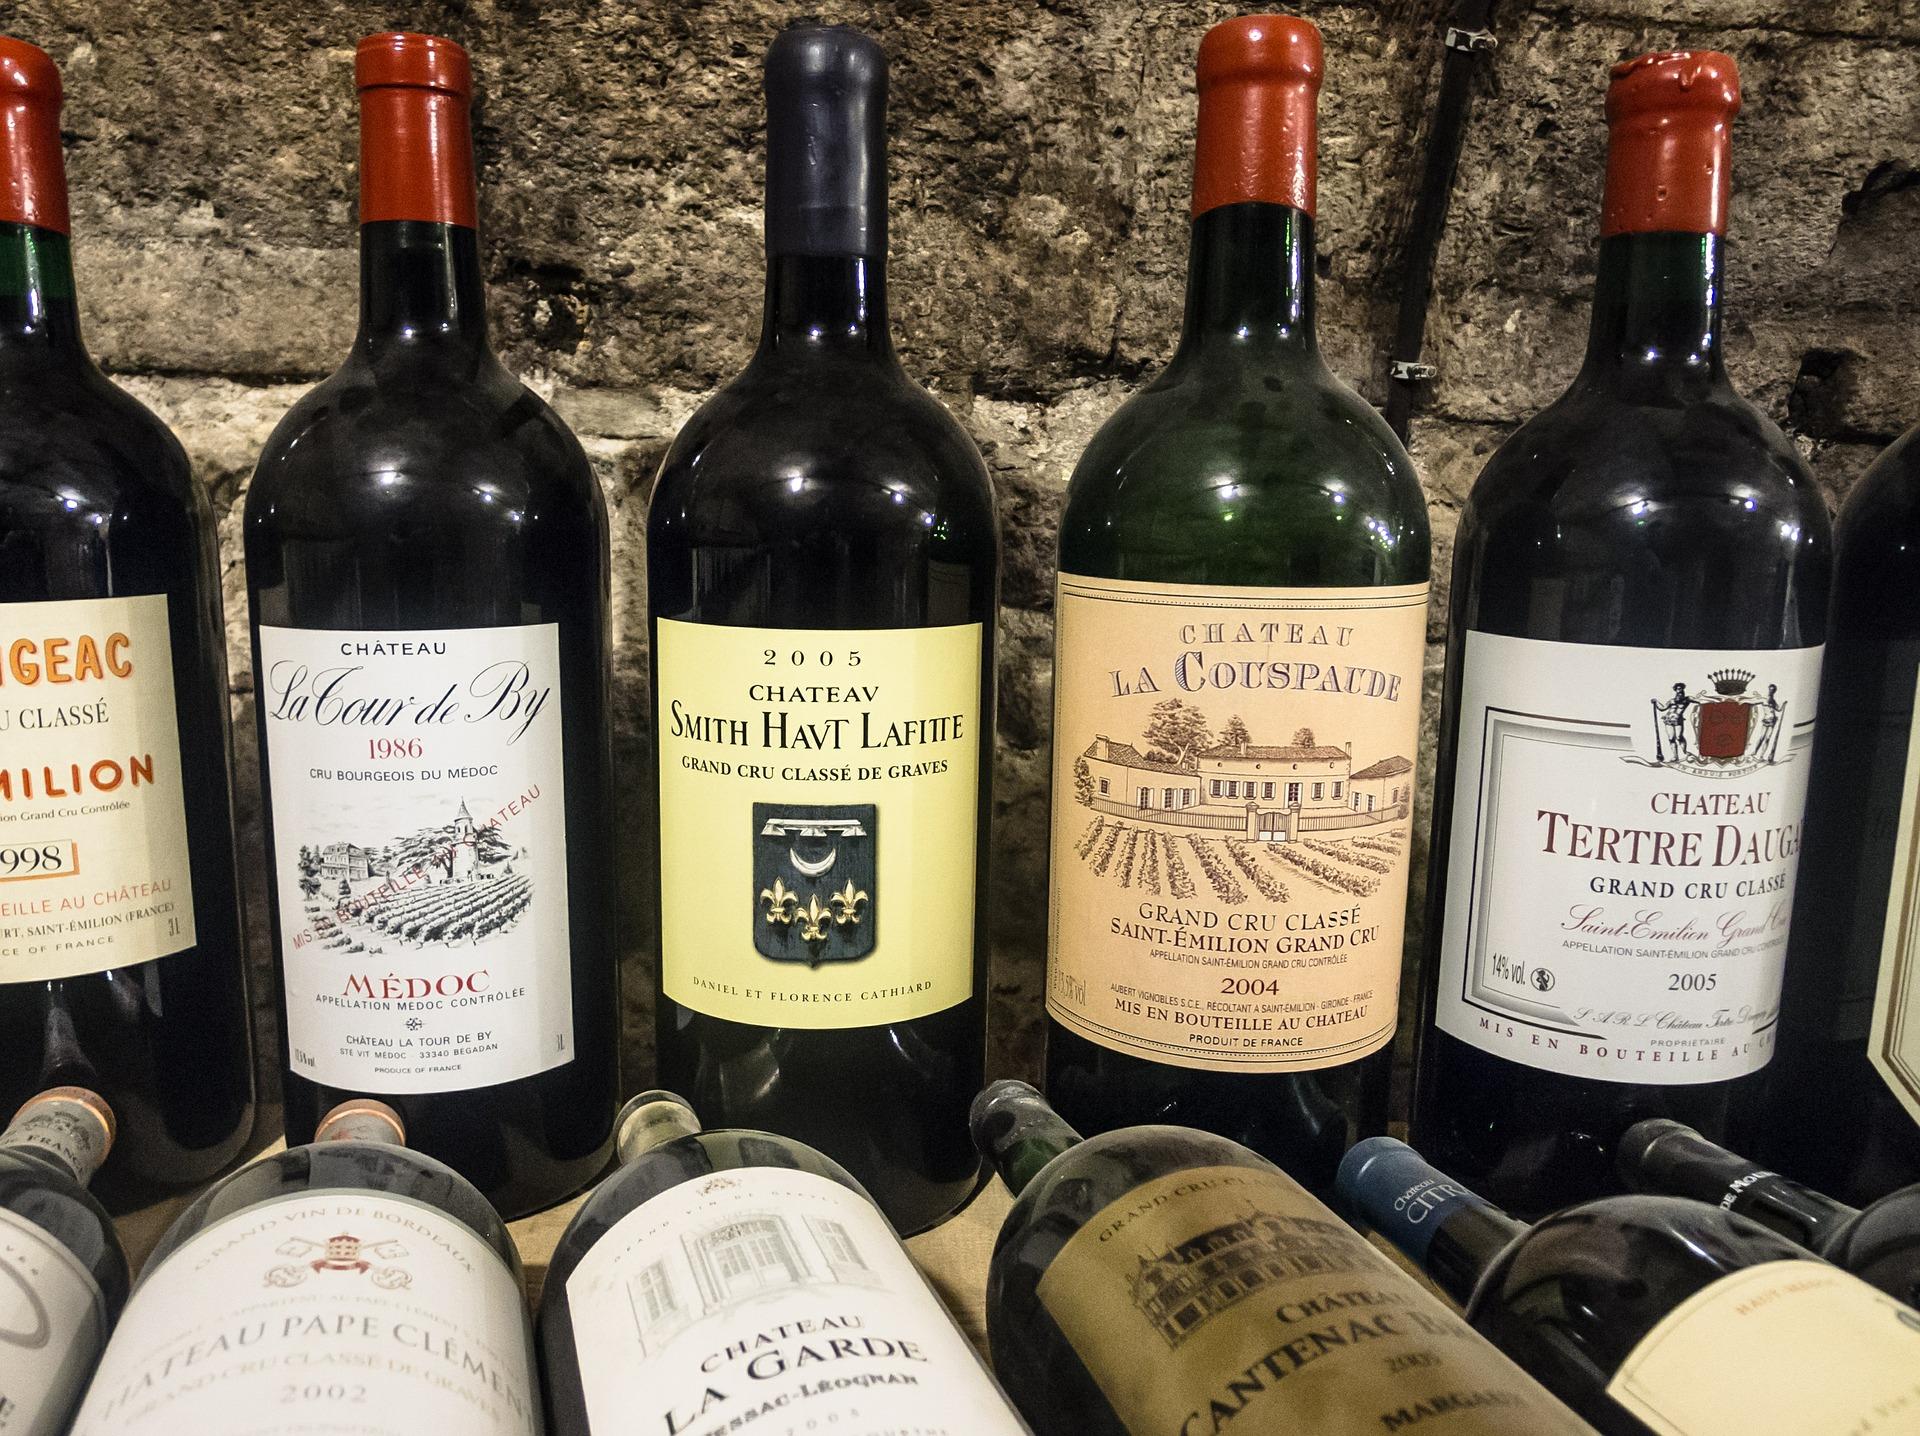 Acheter du vin en ligne, est-ce moins cher ?